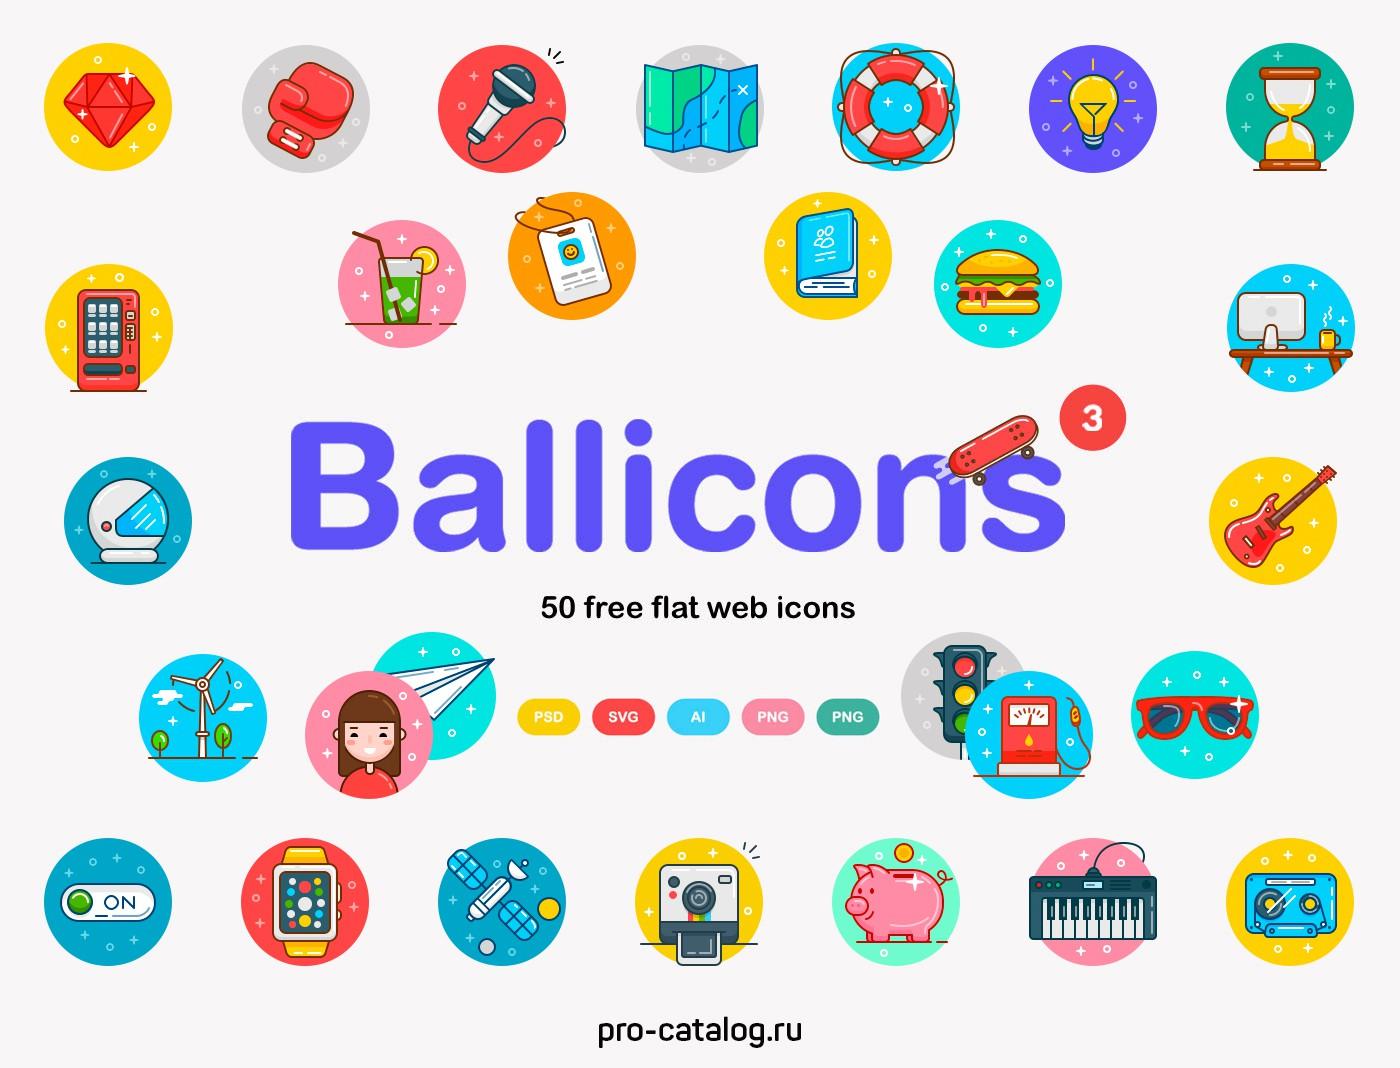 Ballicons 3 - 50 free flat web icons